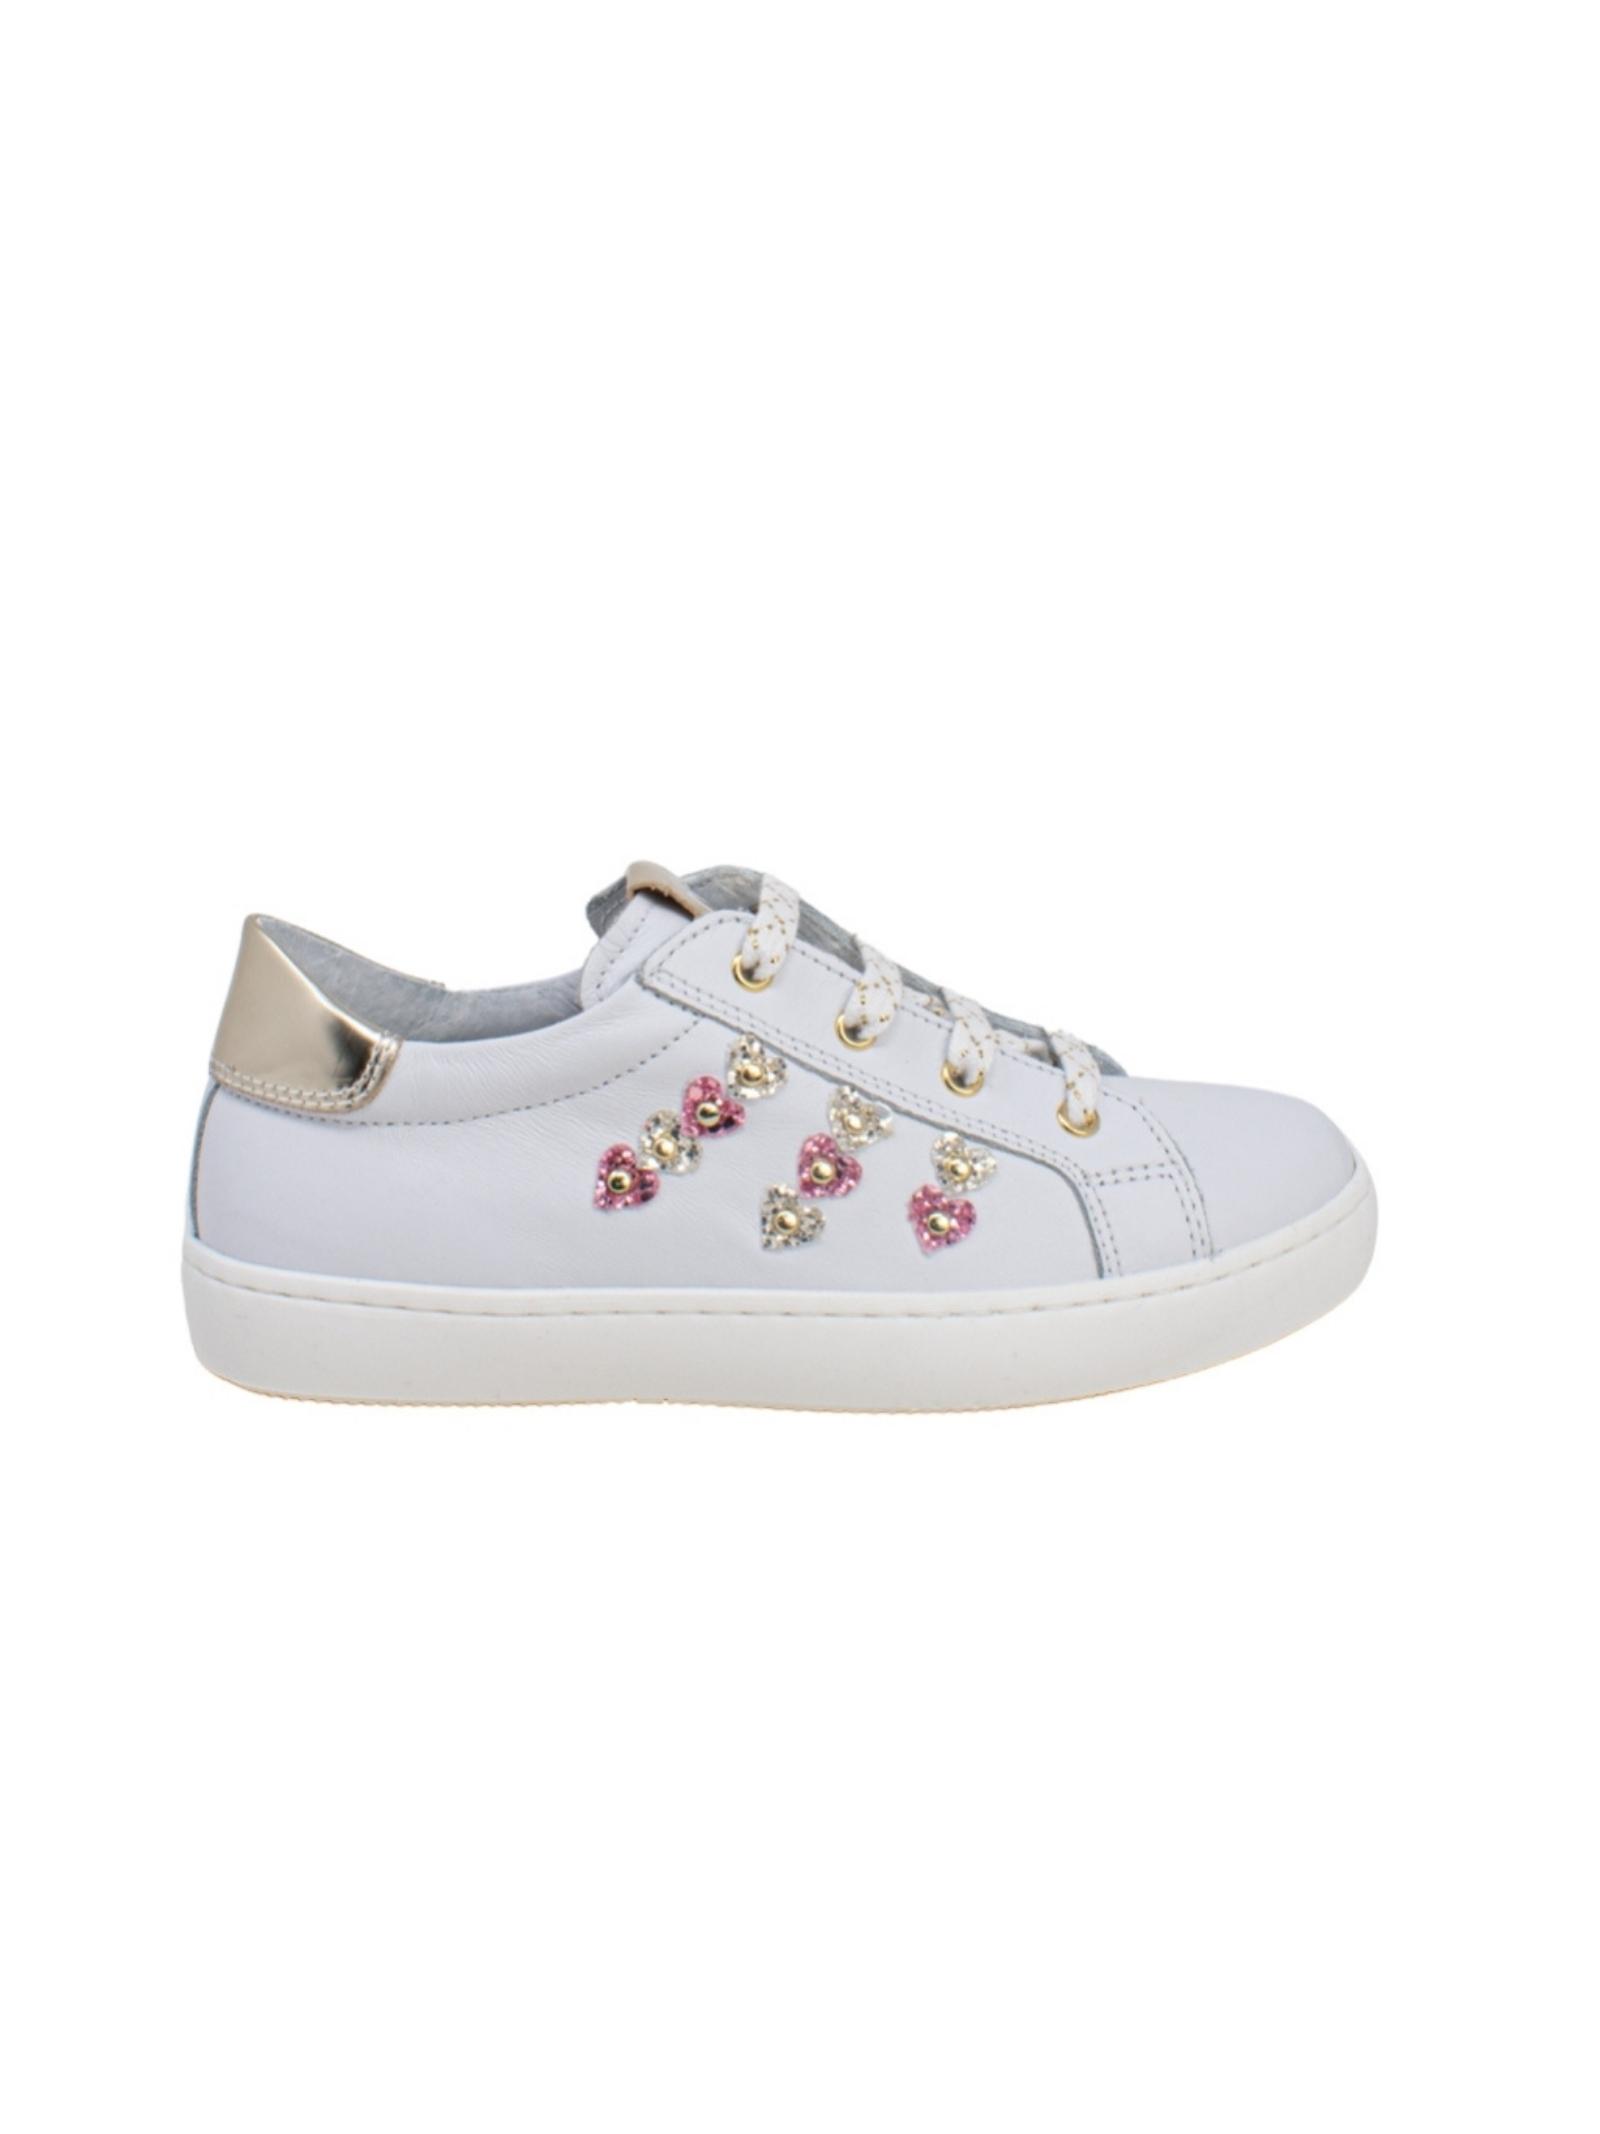 Sneakers Bambina Heart Girl NERO GIARDINI JUNIOR | Sneakers | E121642F707